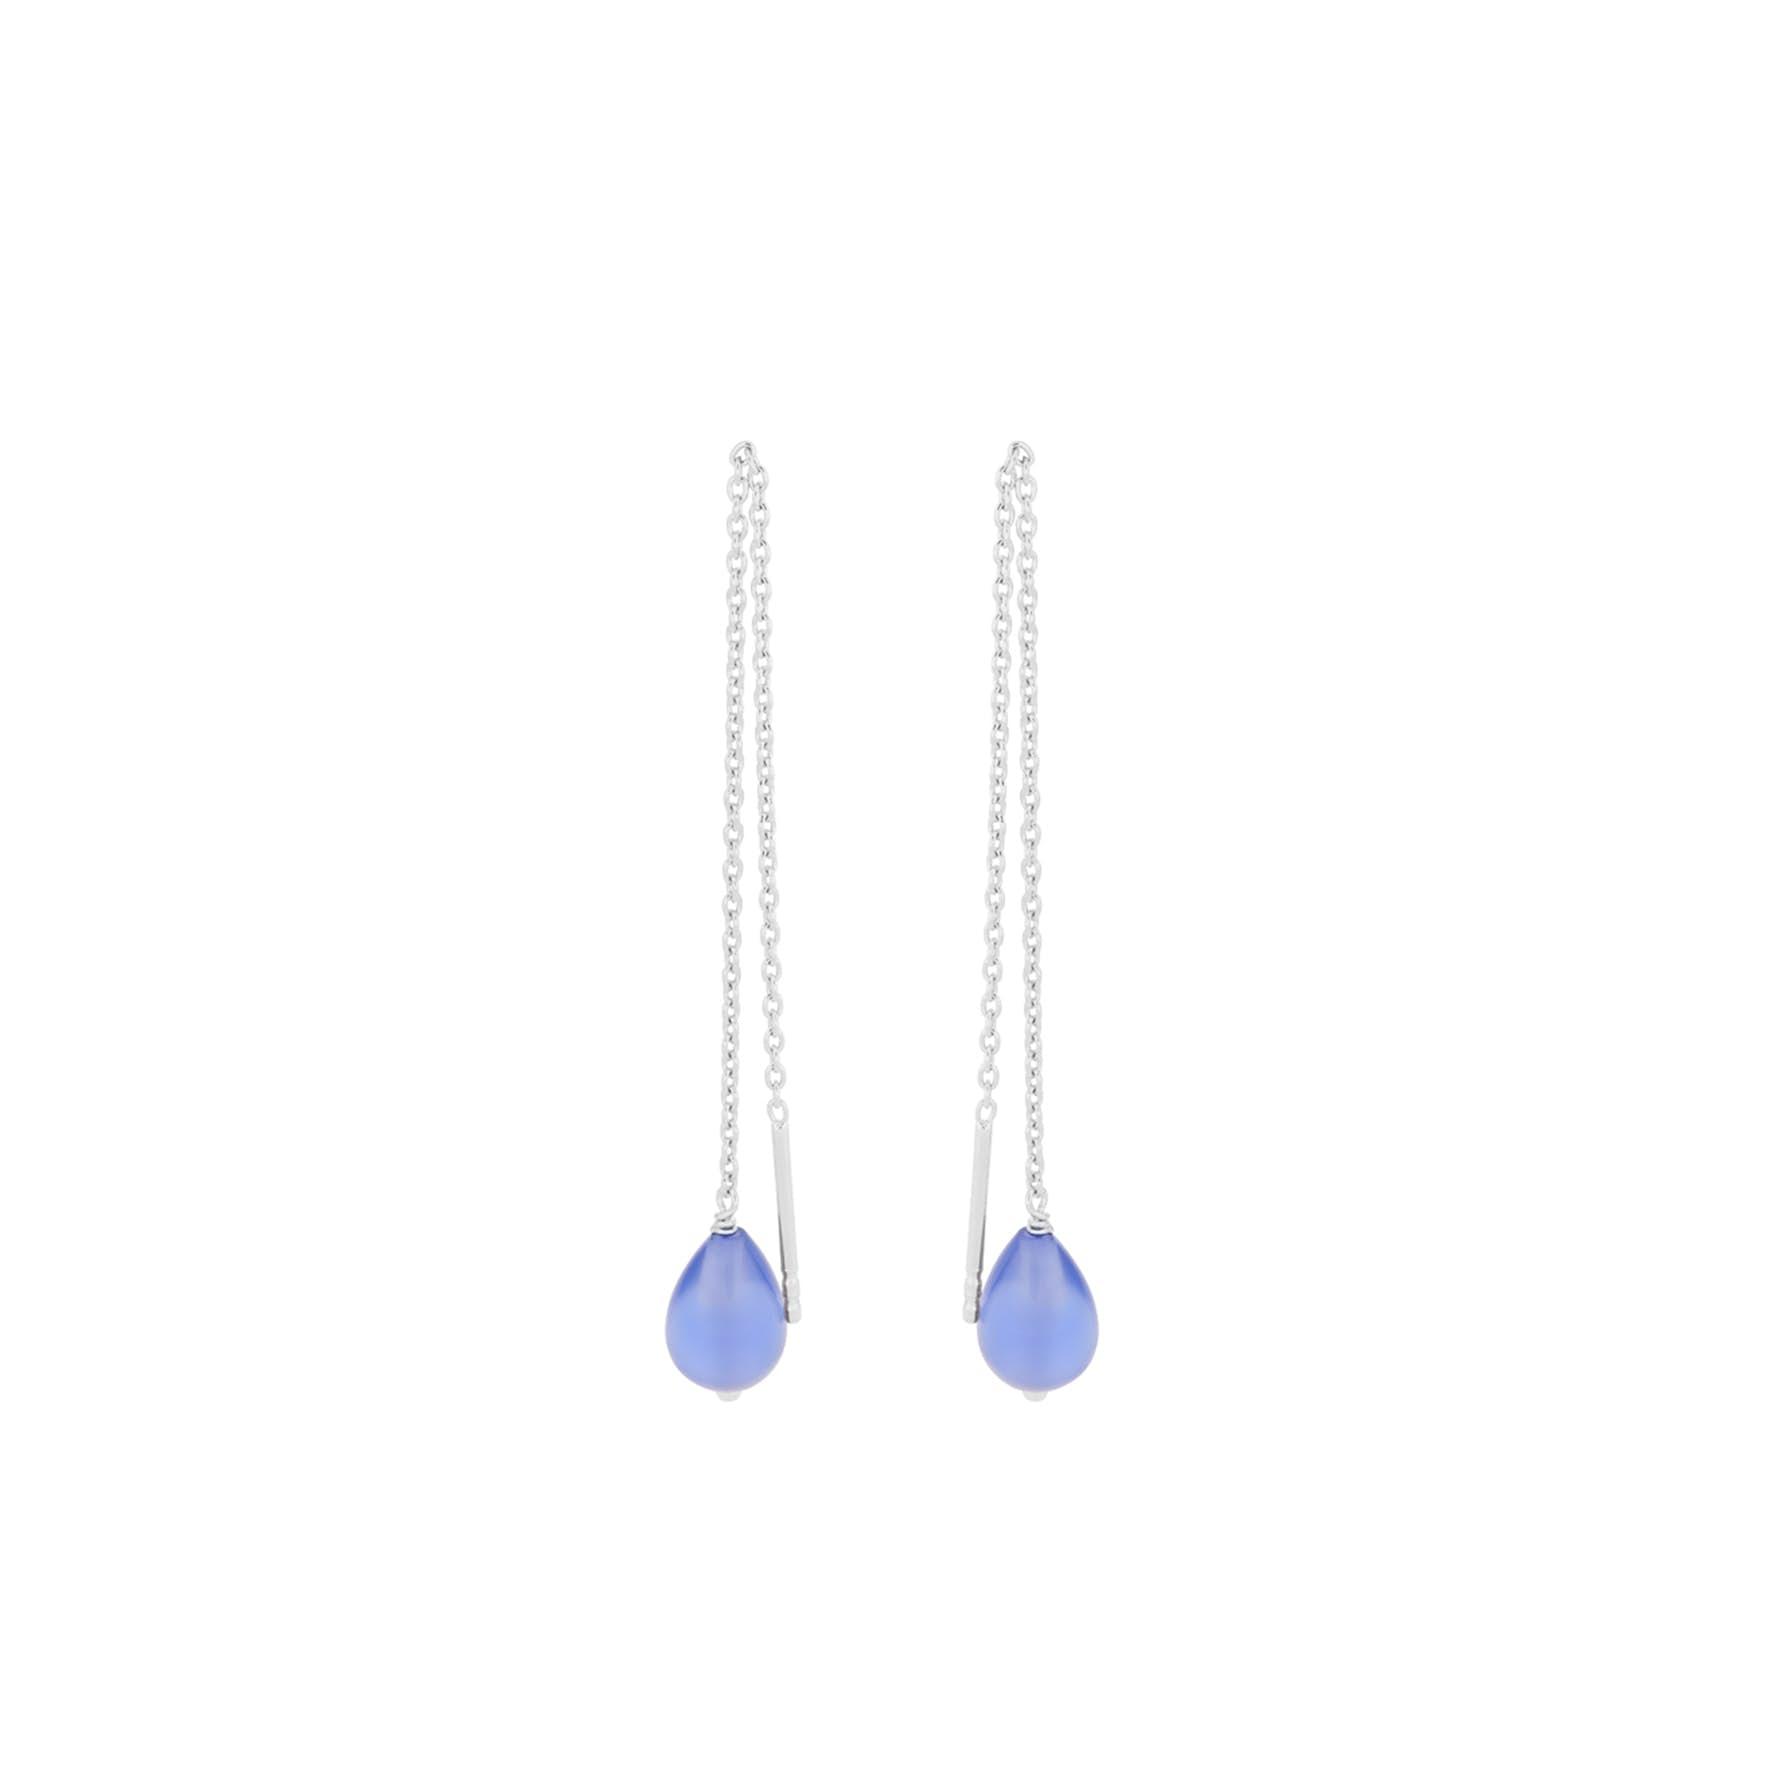 Aqua Blue Earchains